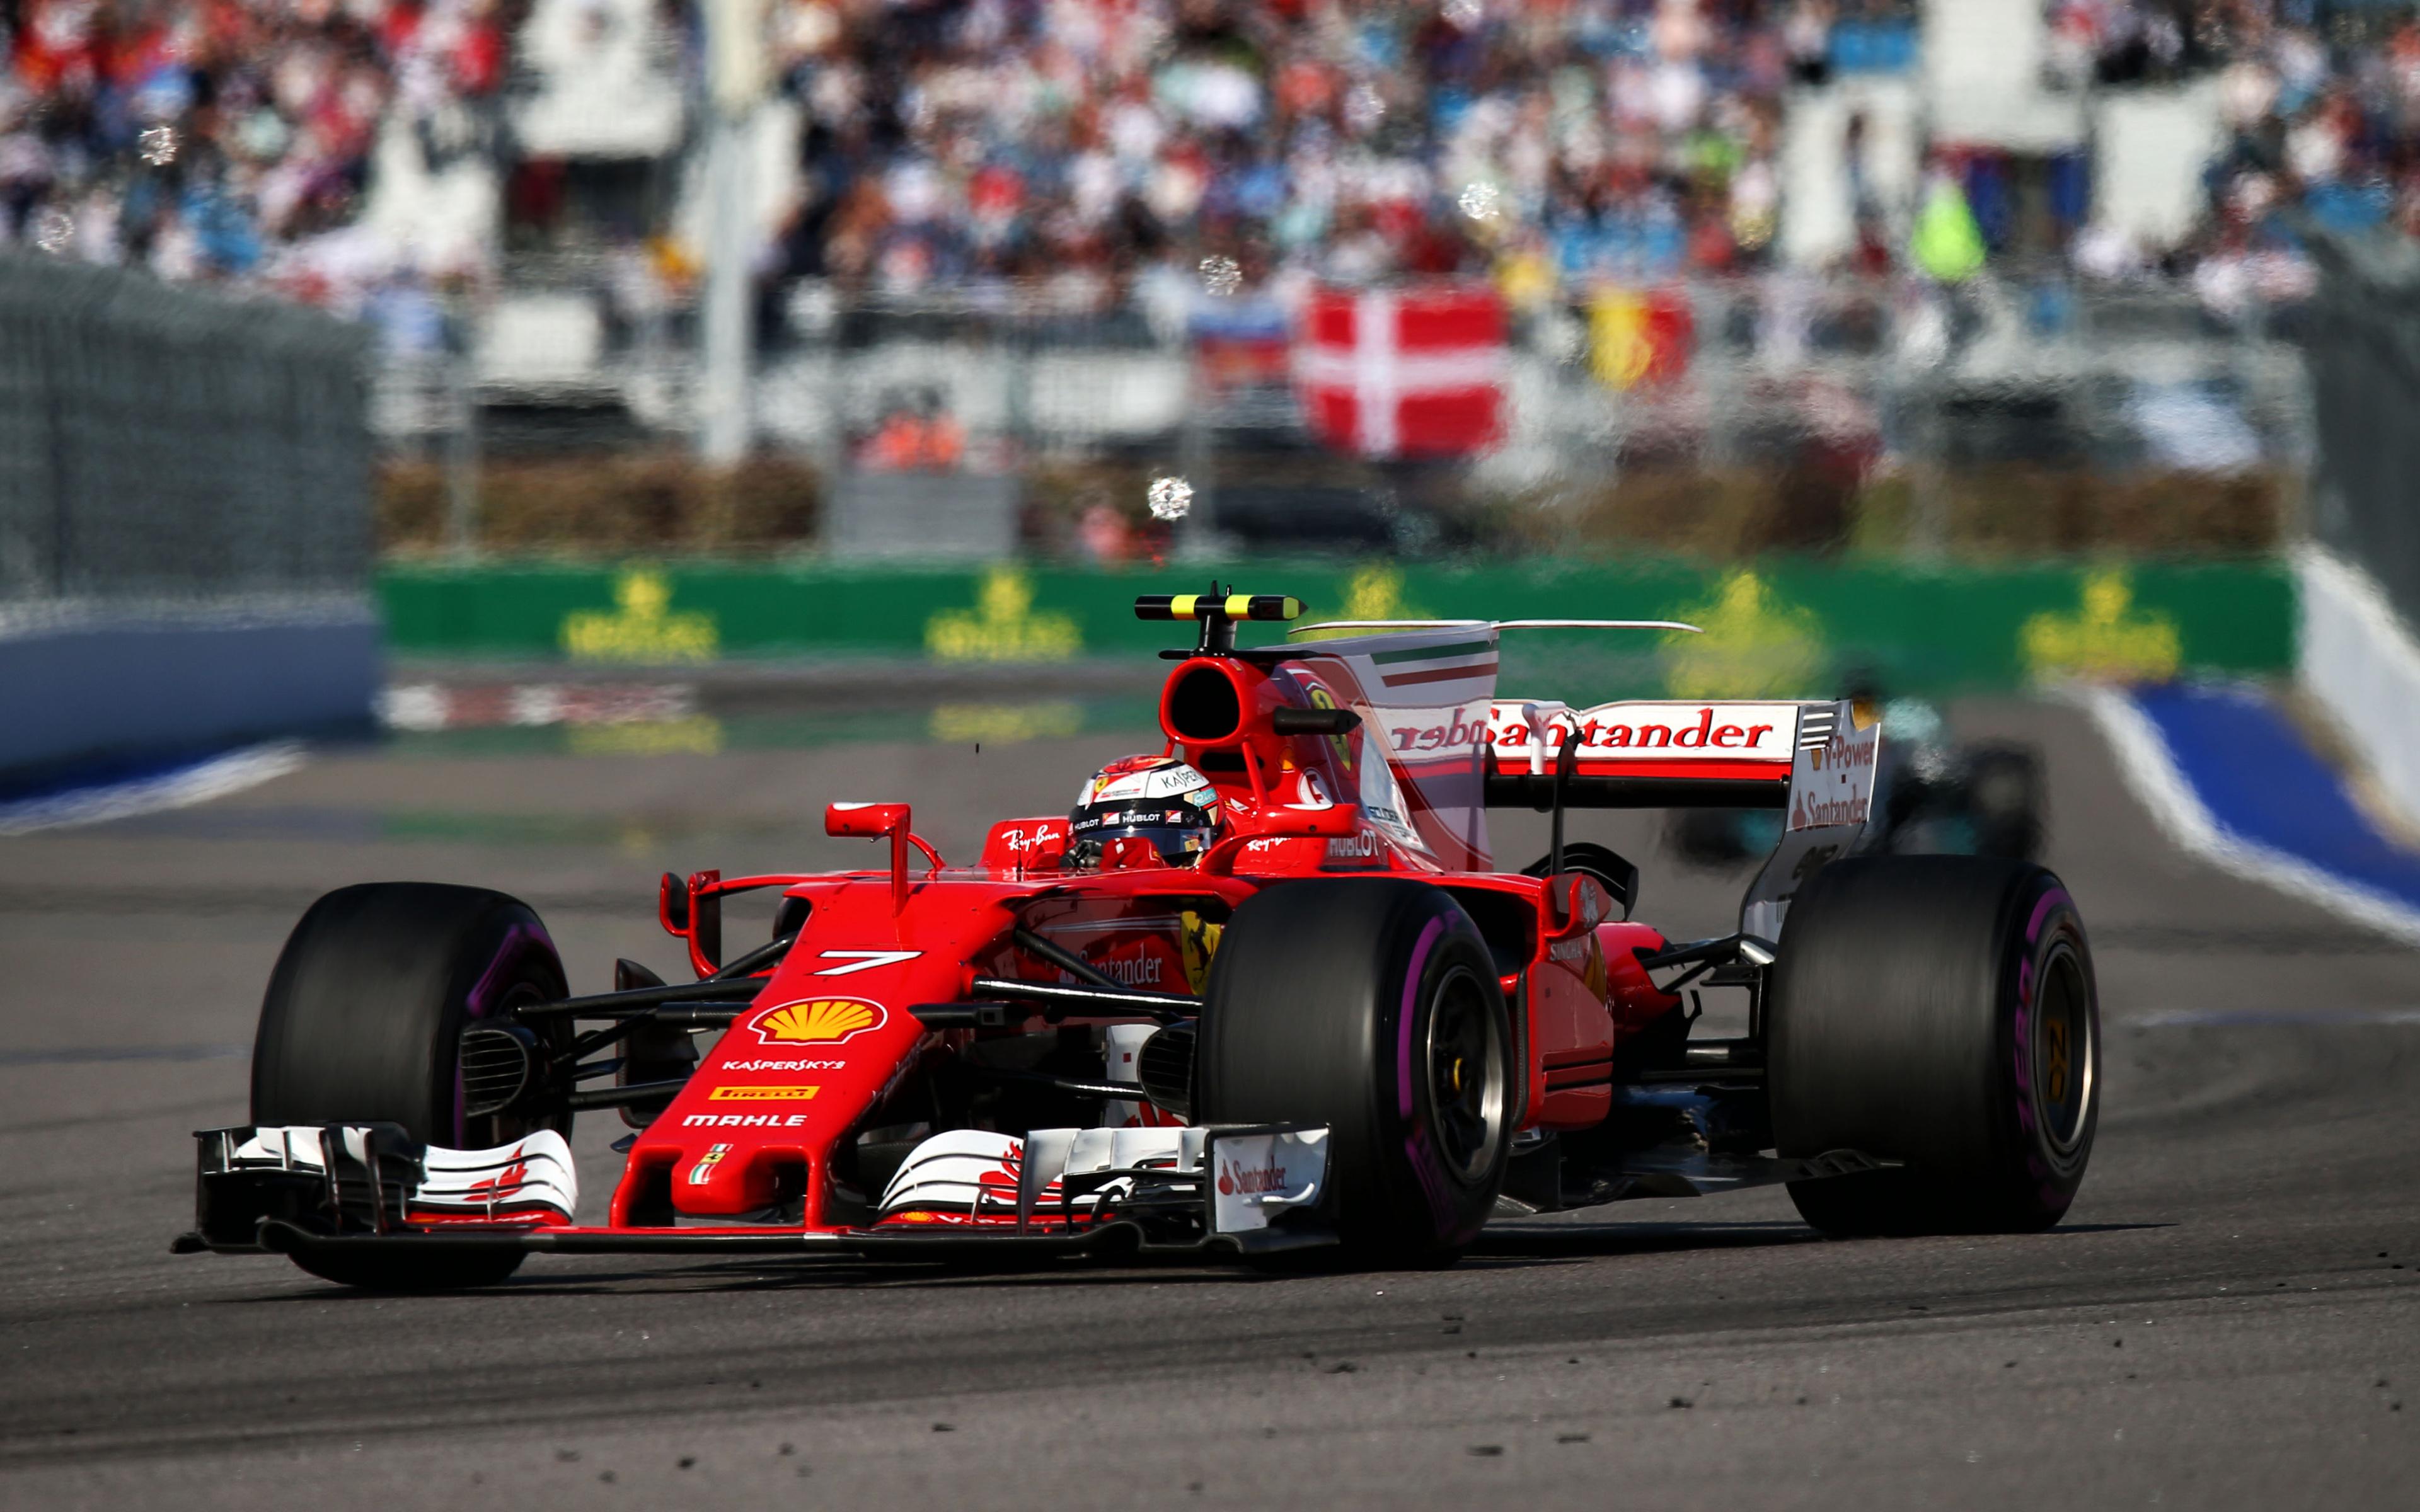 Kimi Raikkonen Ferrari Sf70 H Formula 1 Racing Car Formula 1 Hd Ferrari 3840x2400 Wallpaper Teahub Io